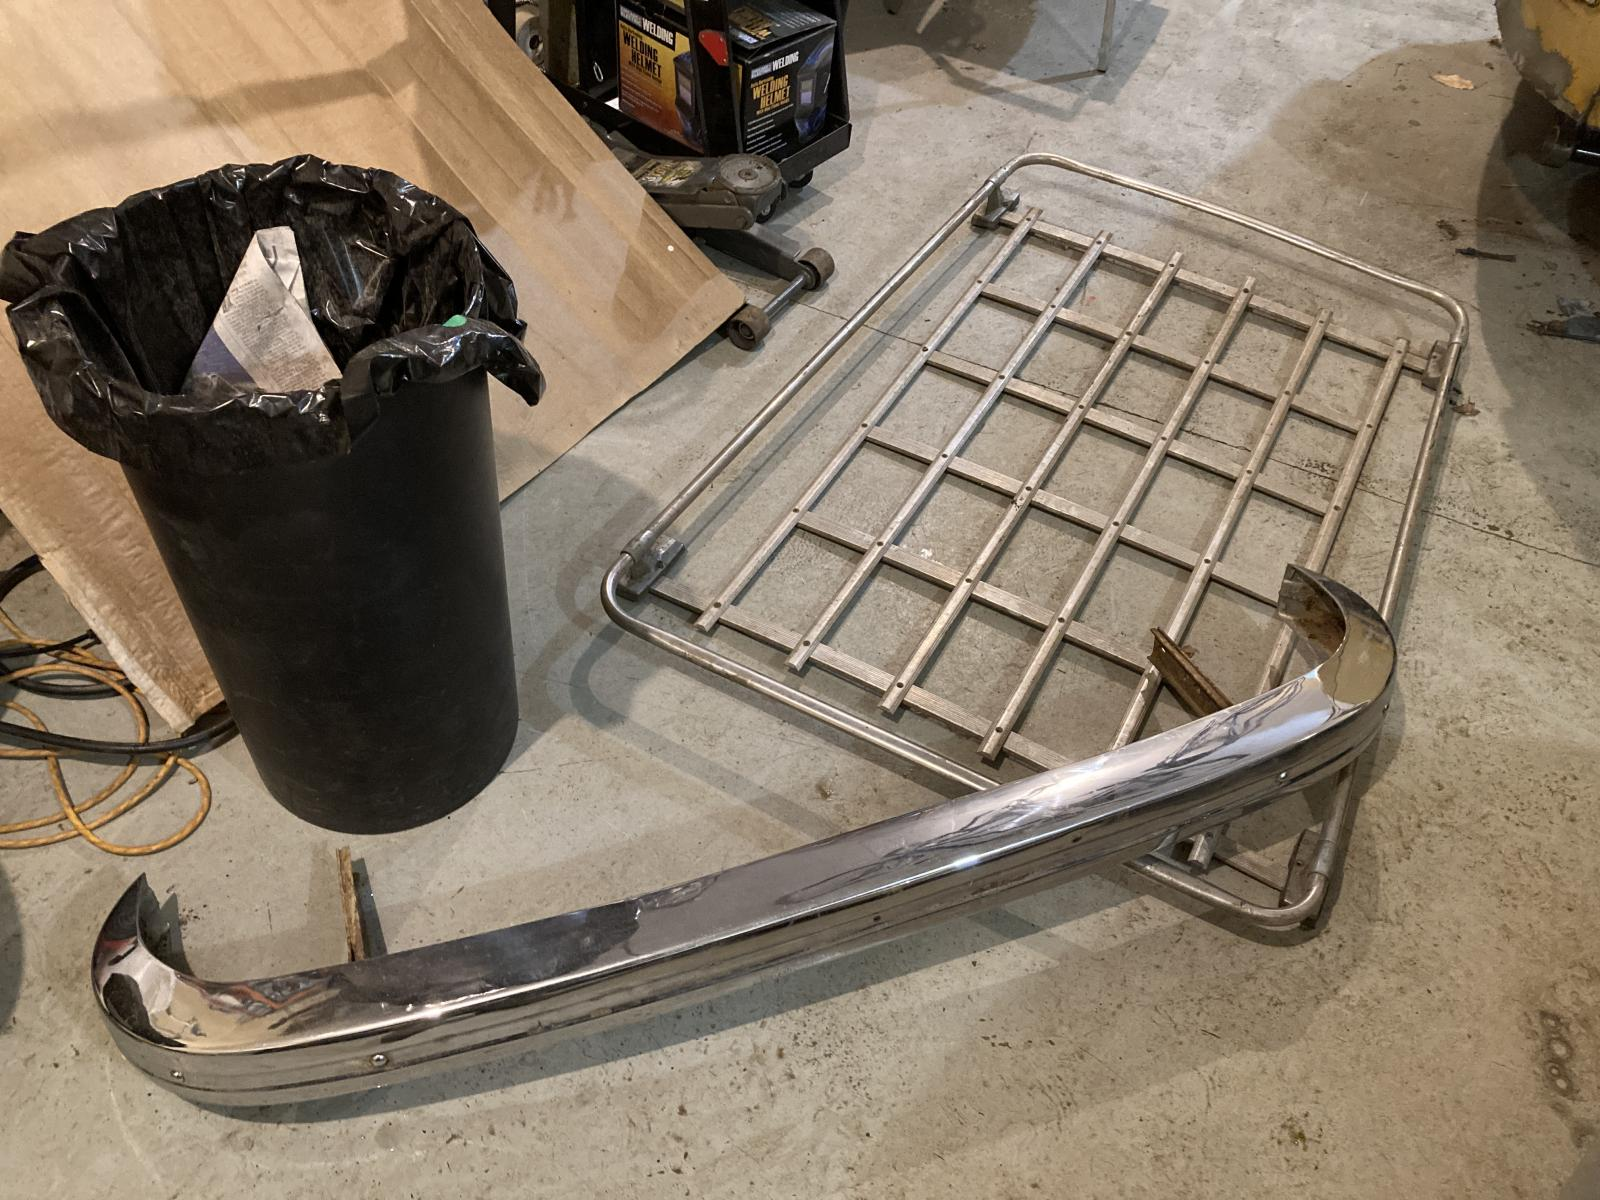 Junkyard parts haul R G Barnum Auto salvage